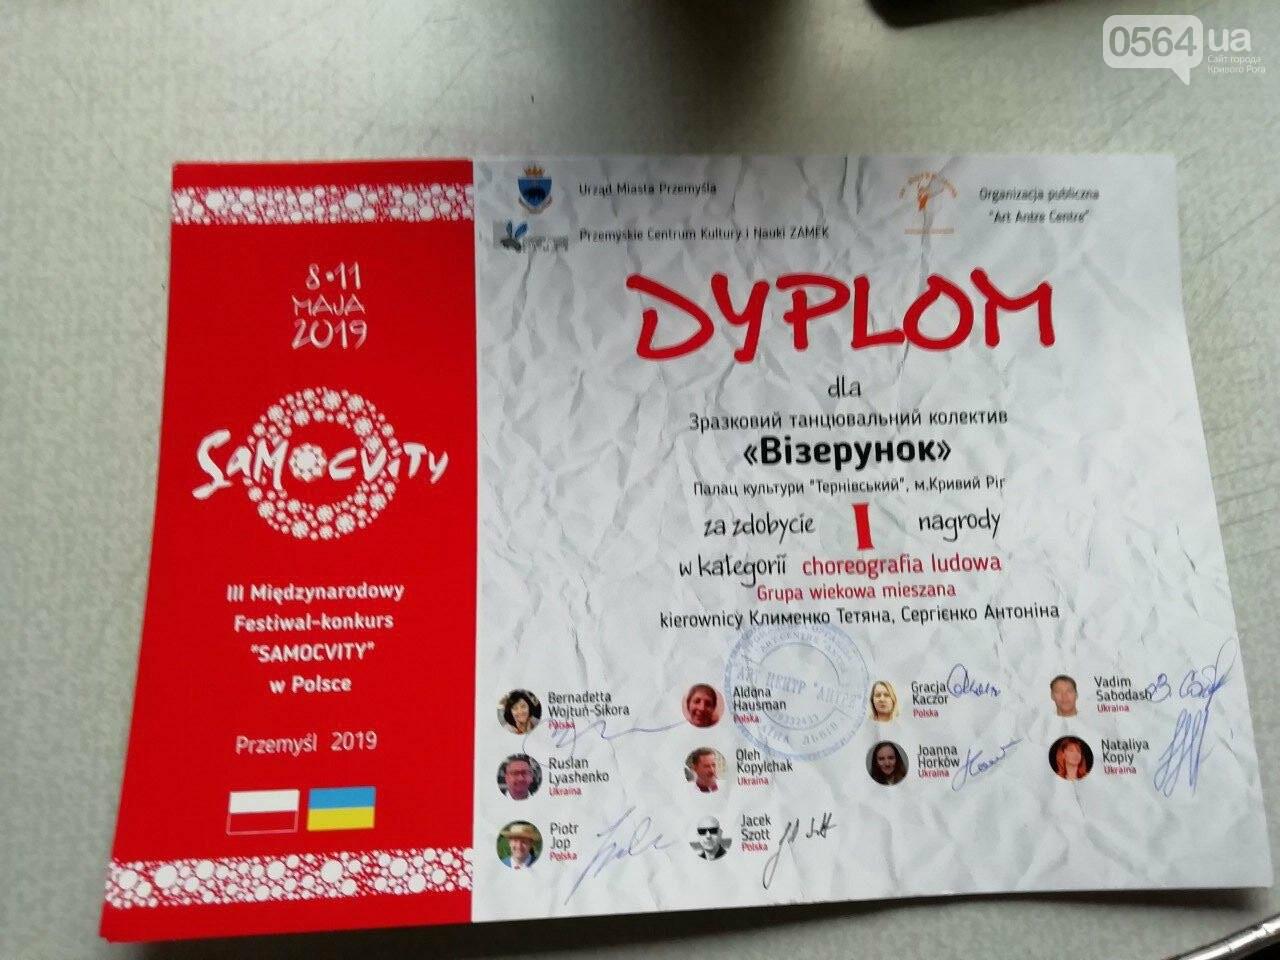 Криворожские танцоры на Международном конкурсе заняли 1 место, - ФОТО , фото-3